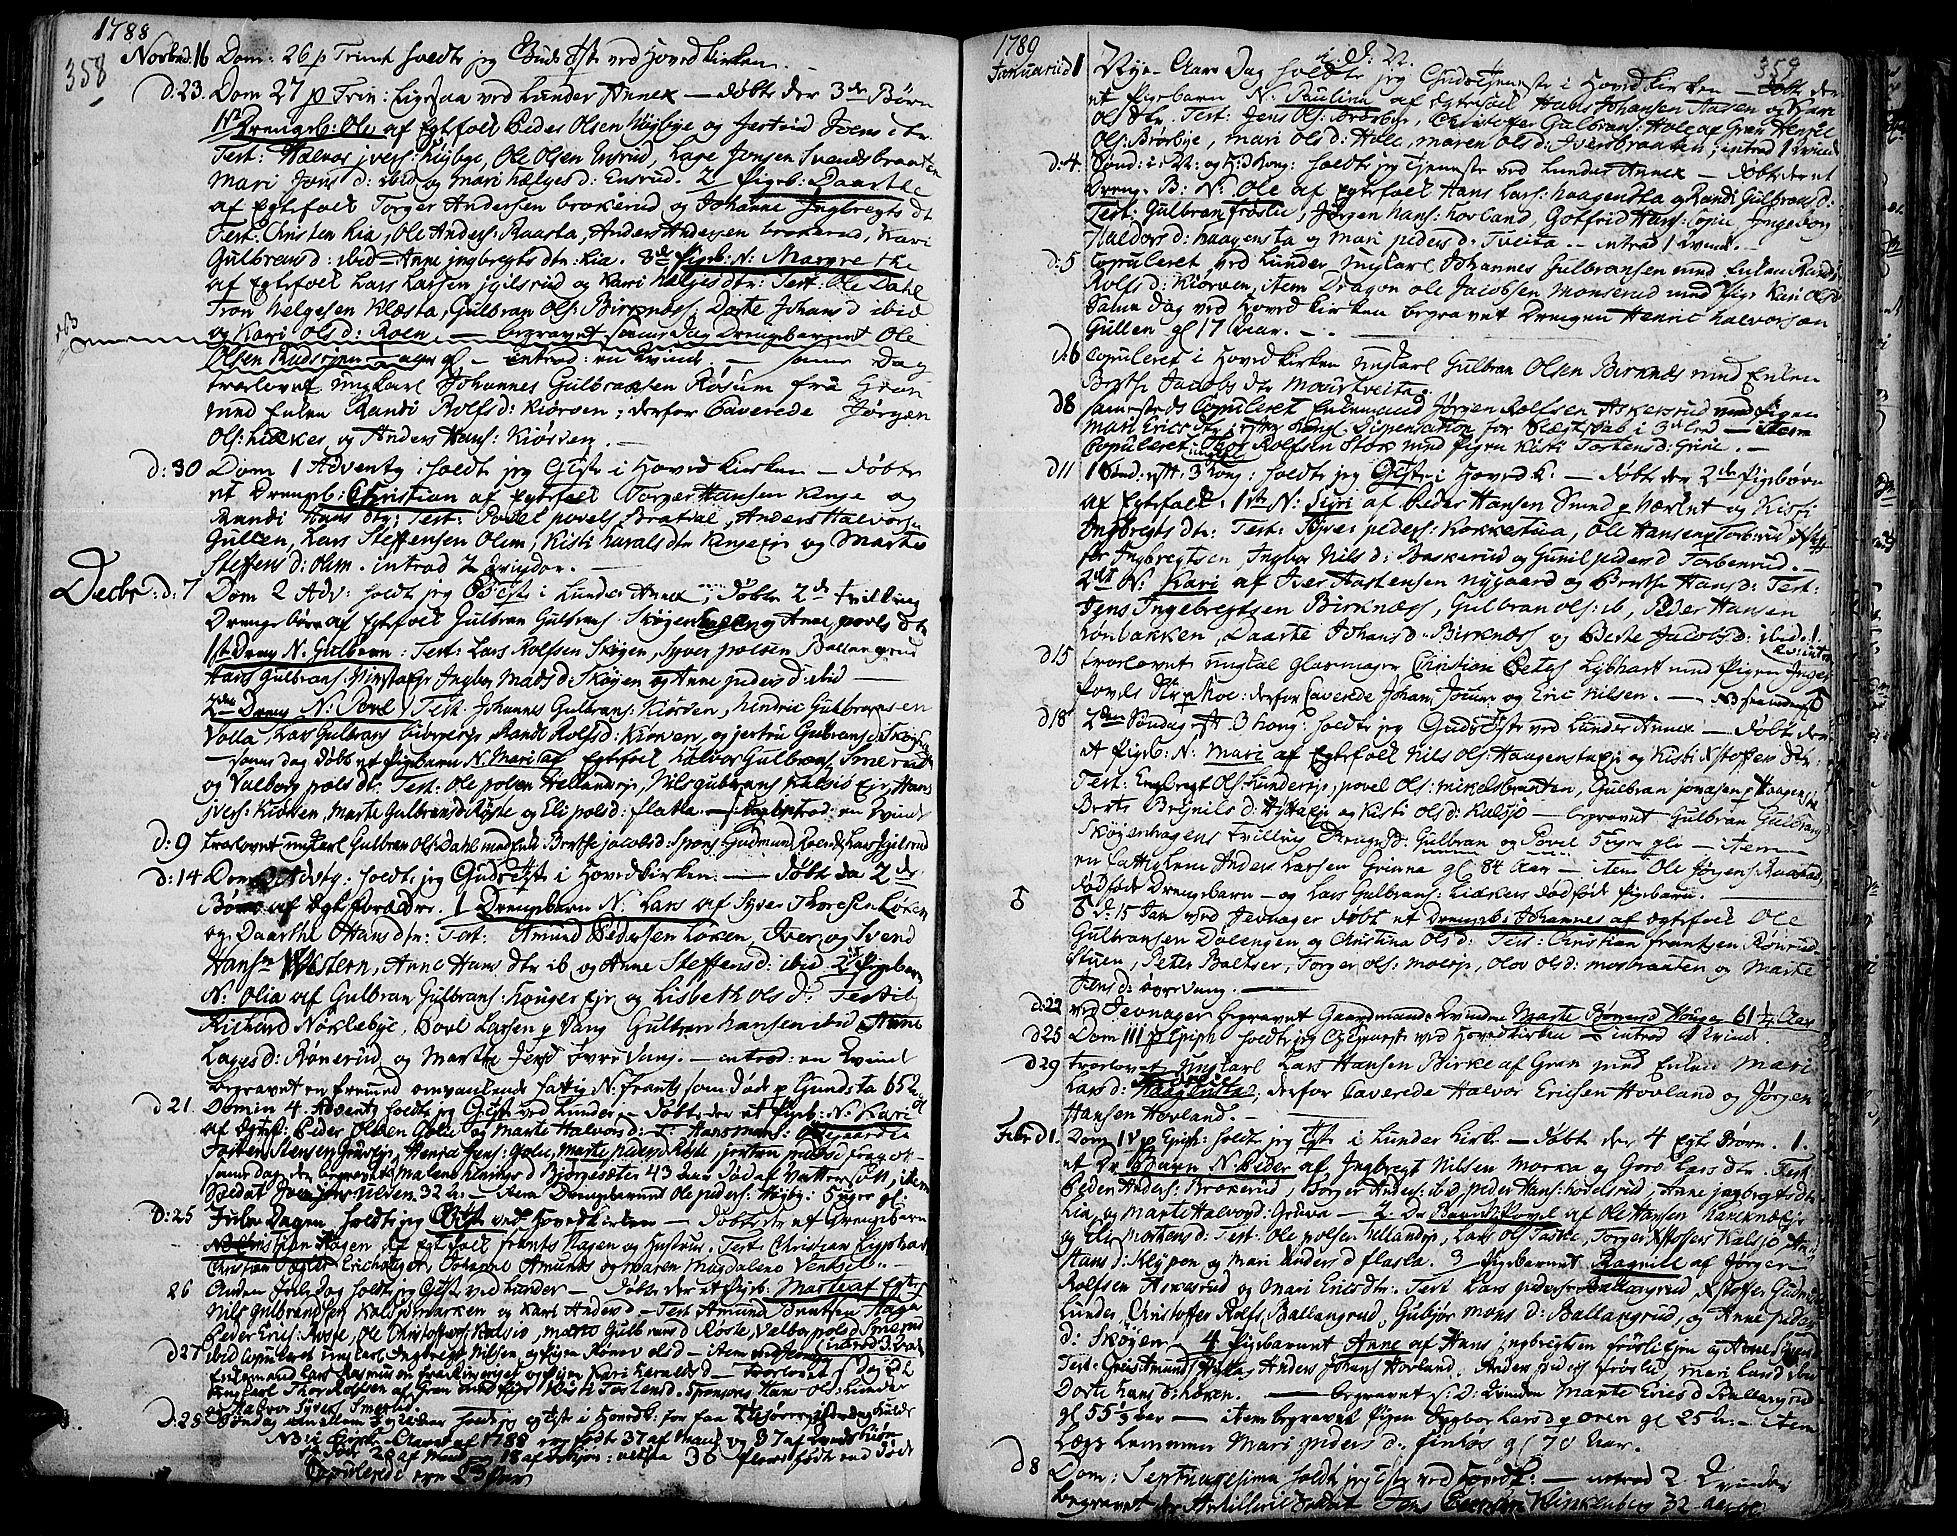 SAH, Jevnaker prestekontor, Ministerialbok nr. 3, 1752-1799, s. 358-359